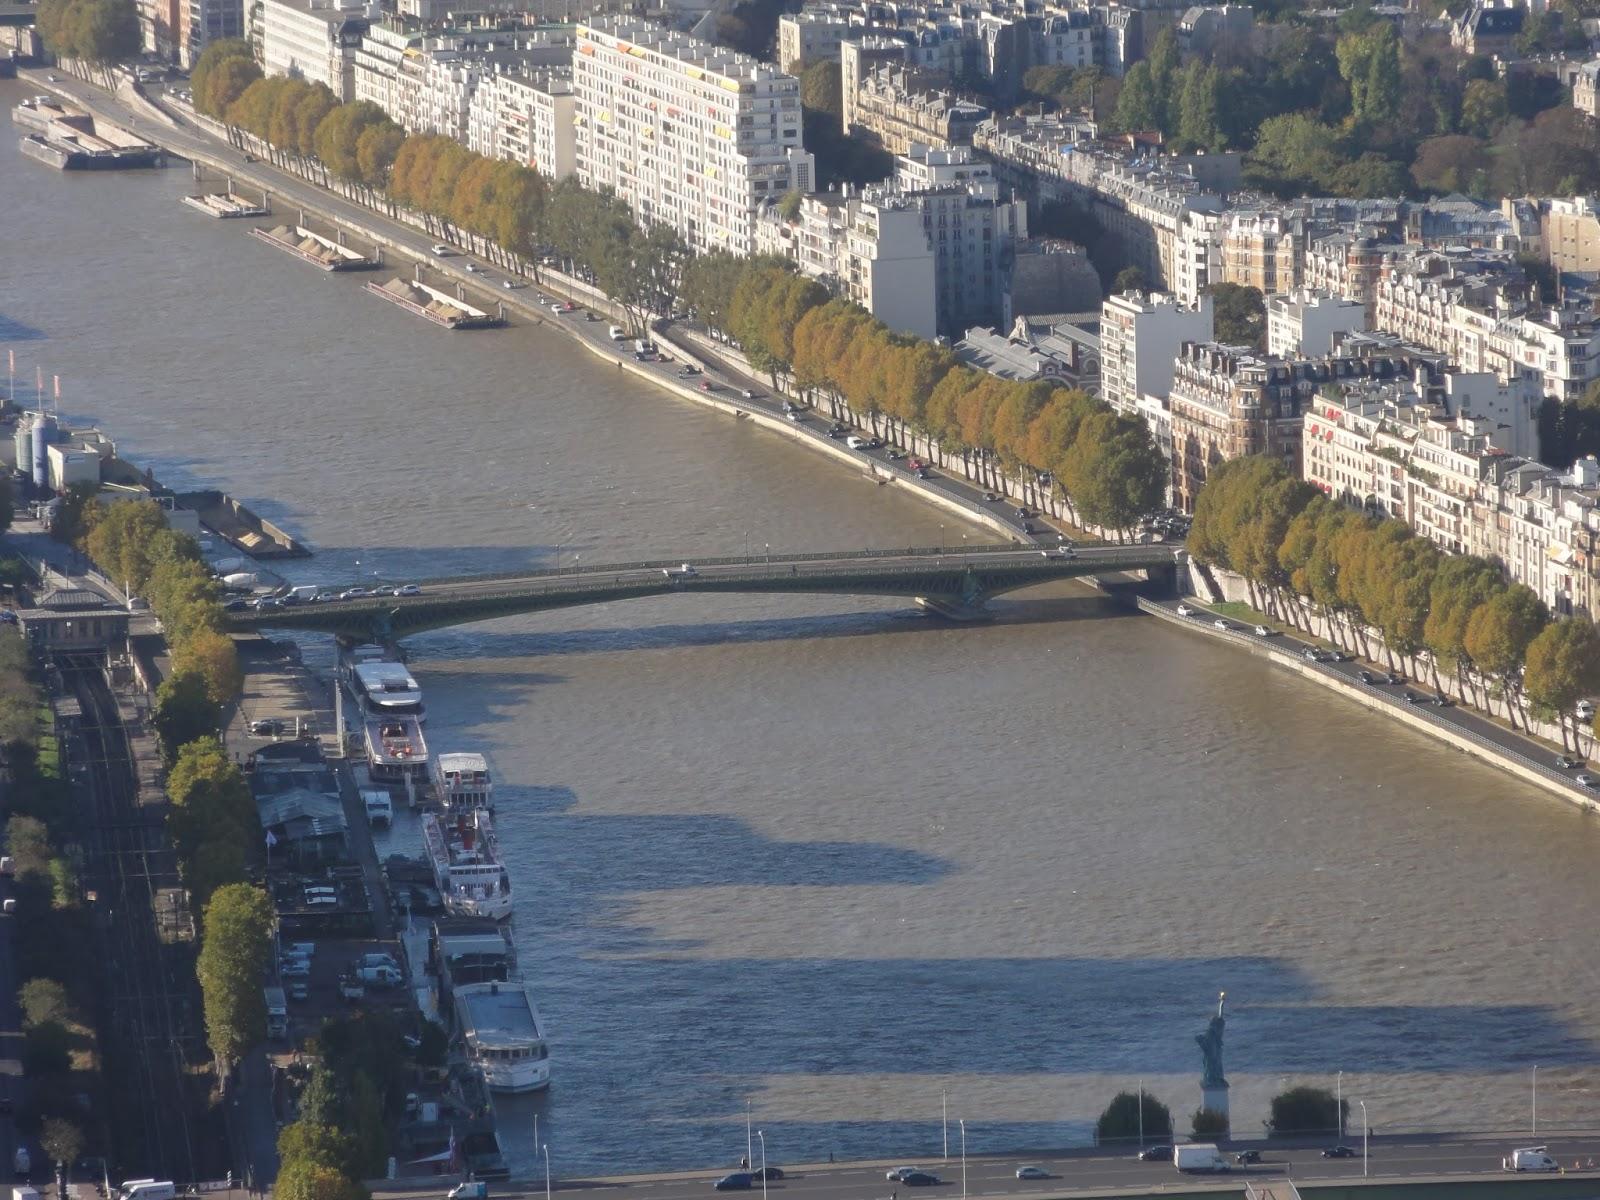 pont mirabeau paris historic walks. Black Bedroom Furniture Sets. Home Design Ideas